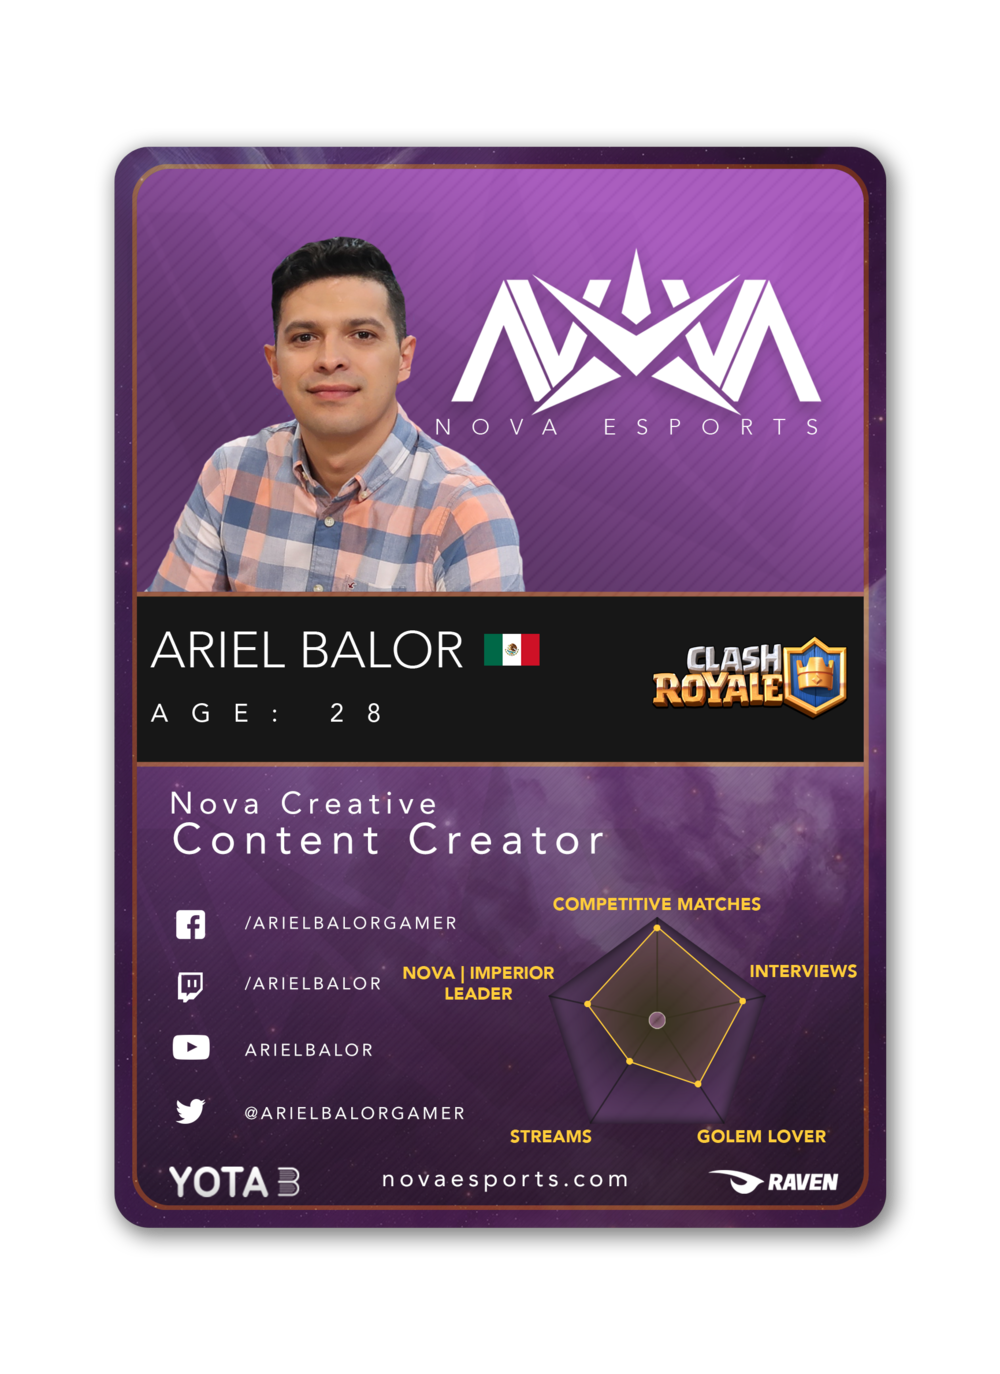 playercard_websitemockup_arielbalorplayercard_vertical.png